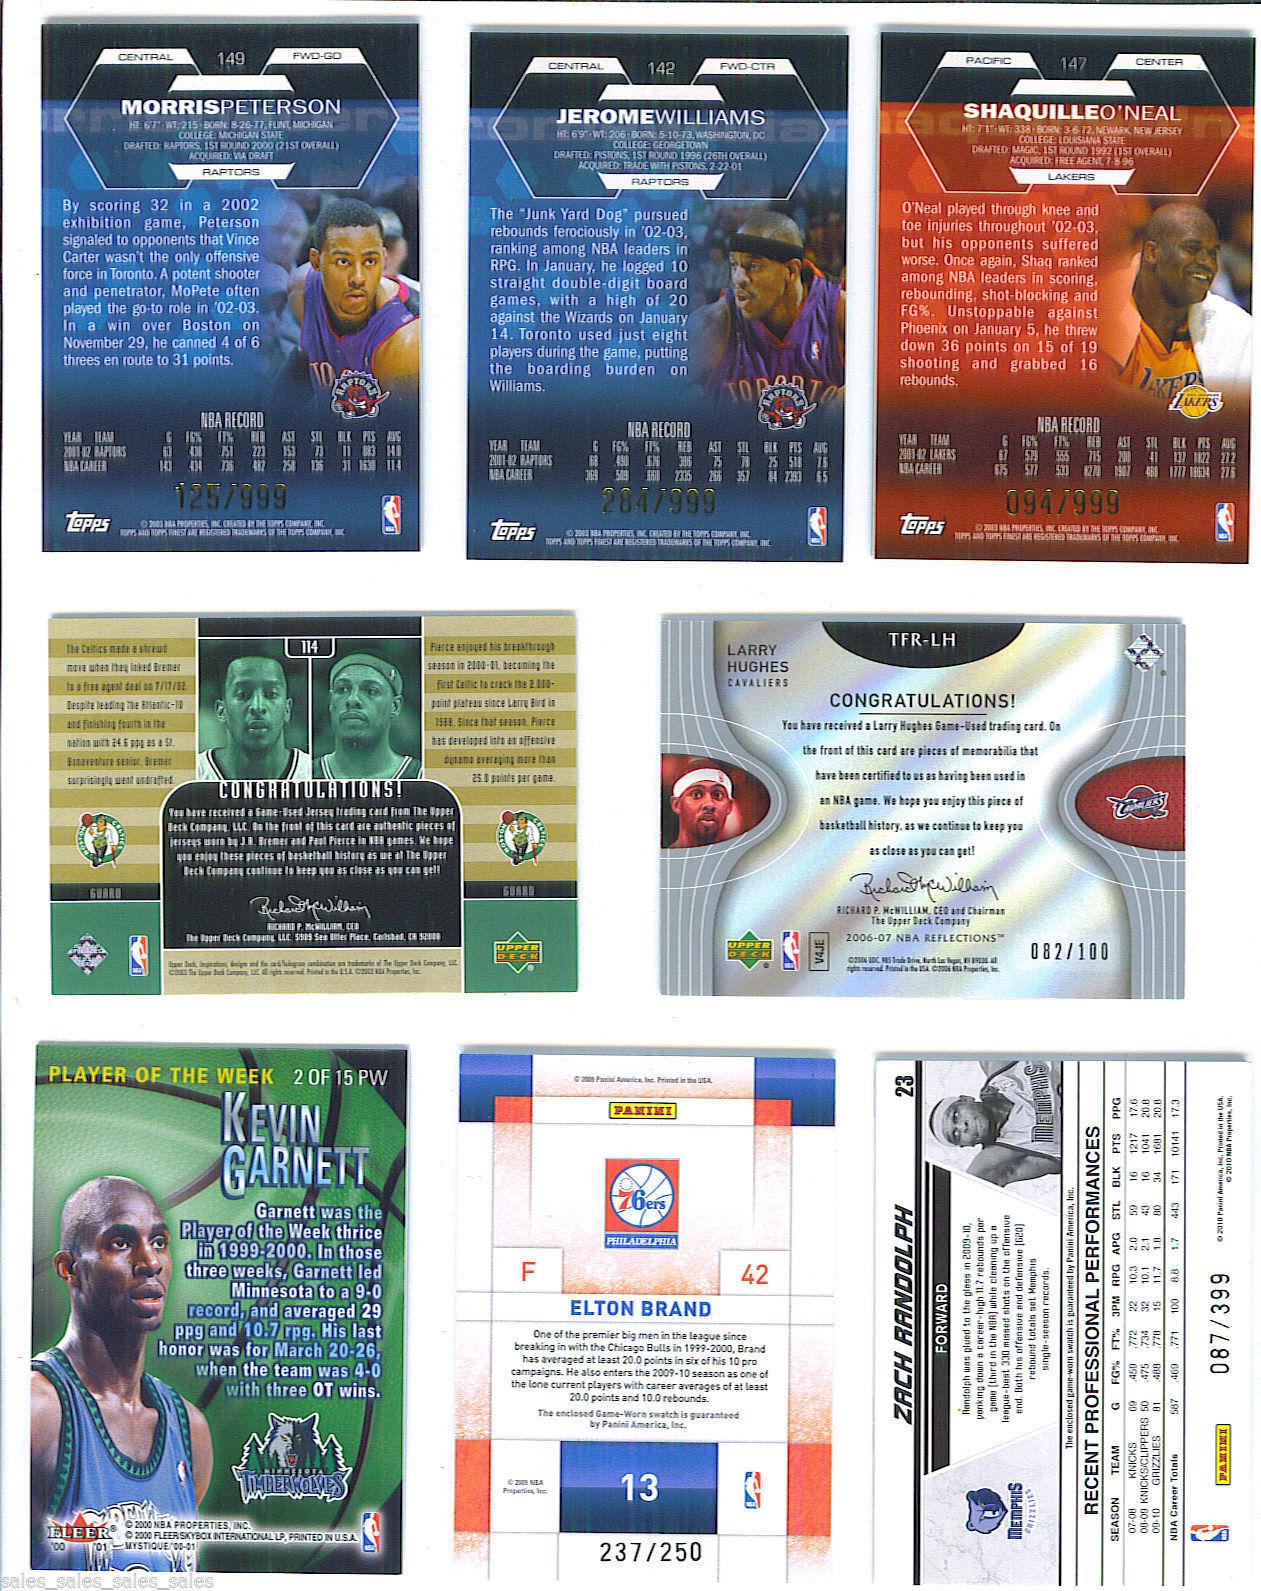 Morris PETERSON 2002-03 Topps Finest SHORT PRINT GAME WORN JERSEY Card 125/999